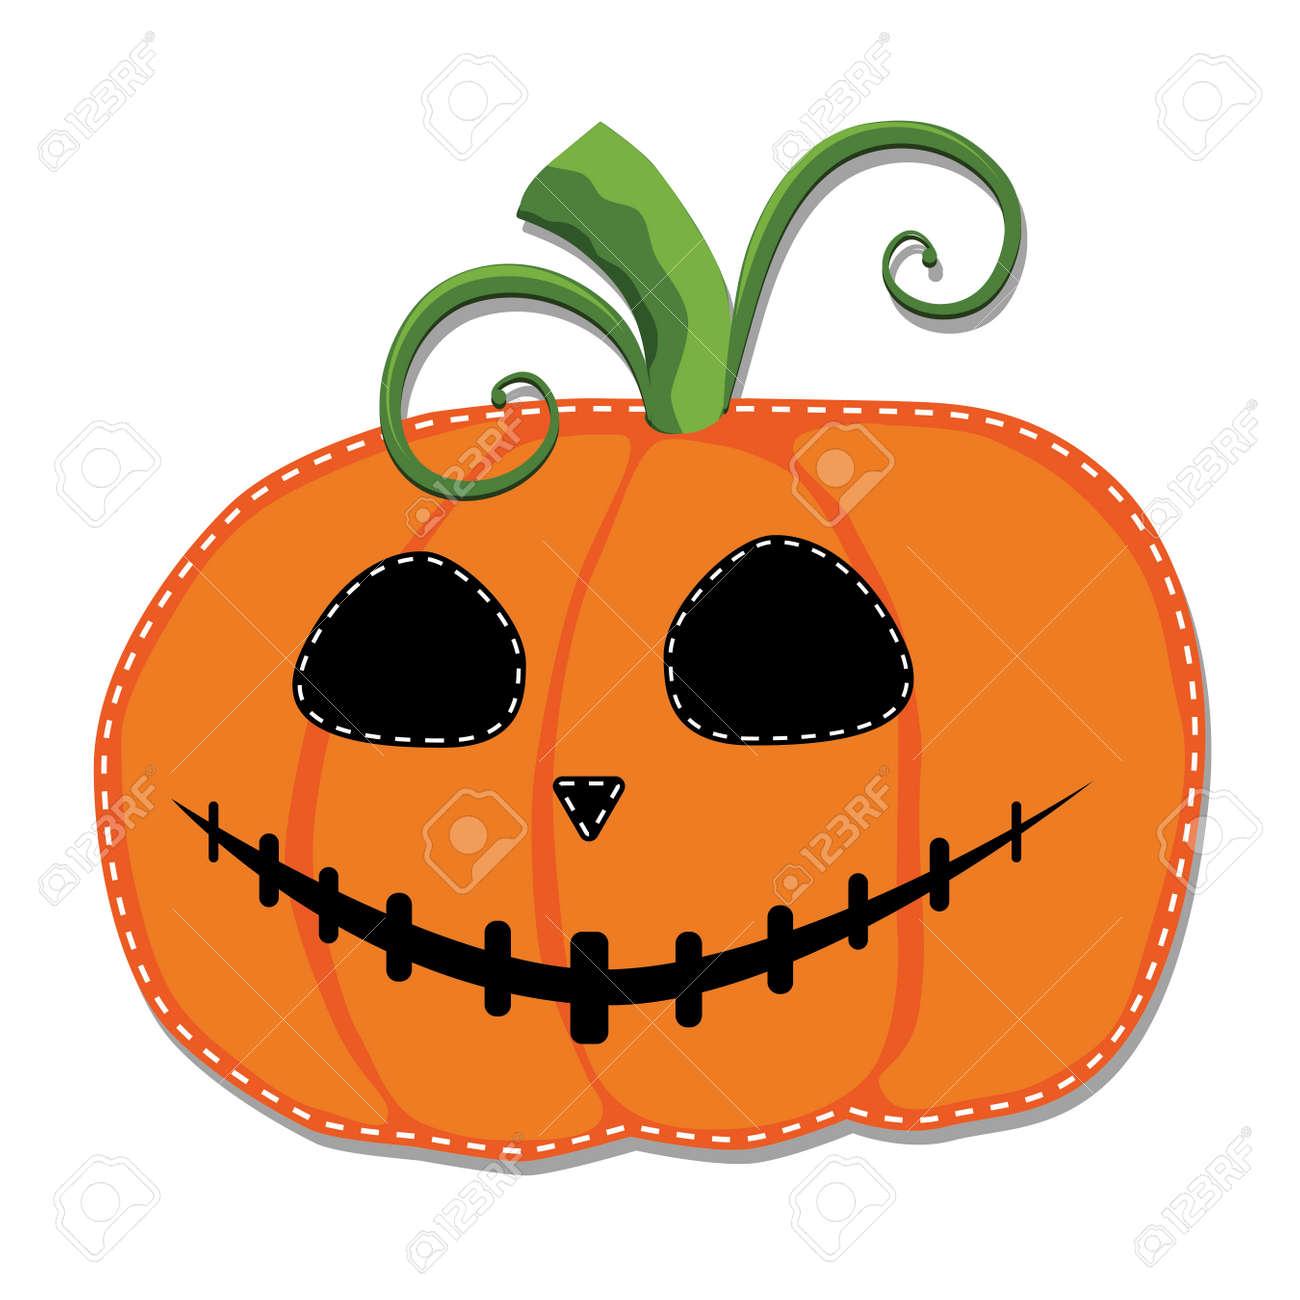 jack o lantern or carved pumpkin on a transparent background royalty rh 123rf com  pumpkin clipart transparent background